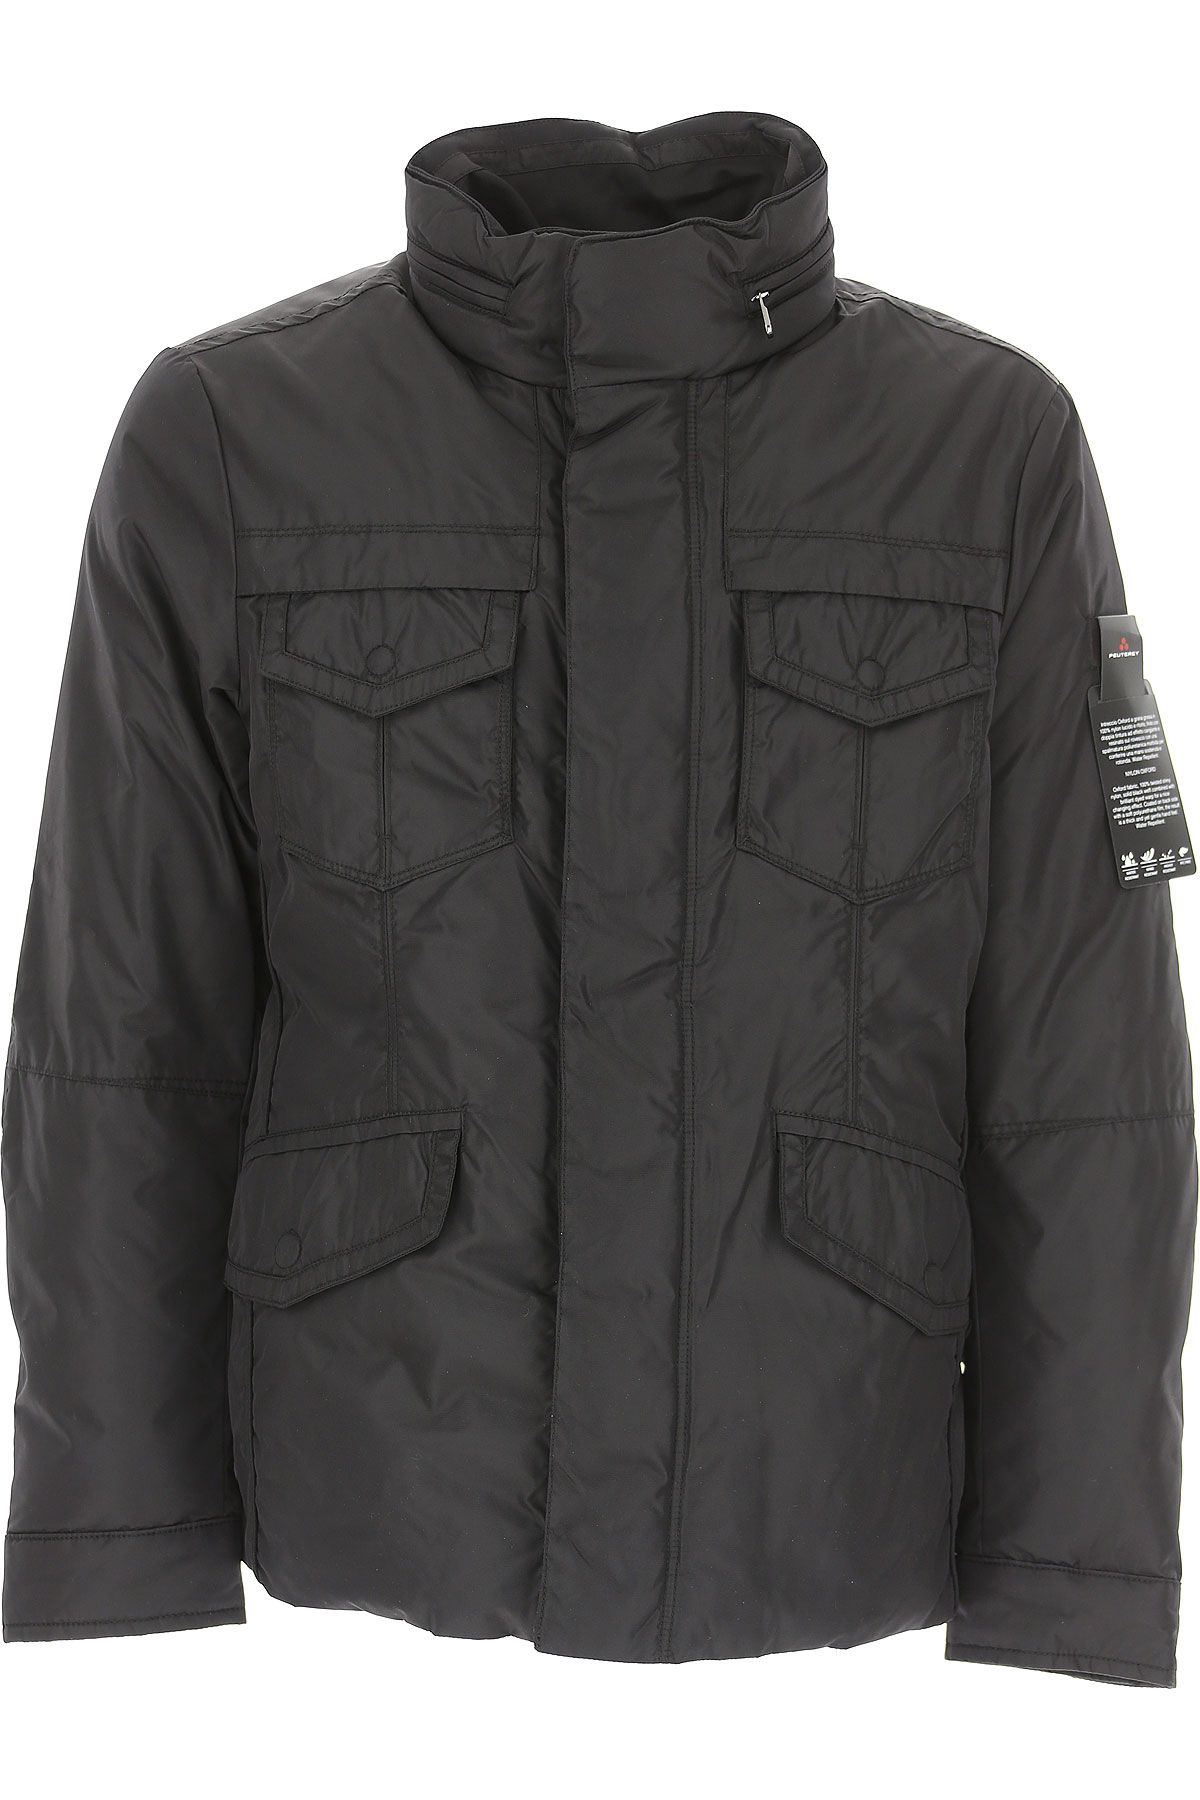 Image of Peuterey Down Jacket for Men, Puffer Ski Jacket, Black, polyamide, 2017, L M S XL